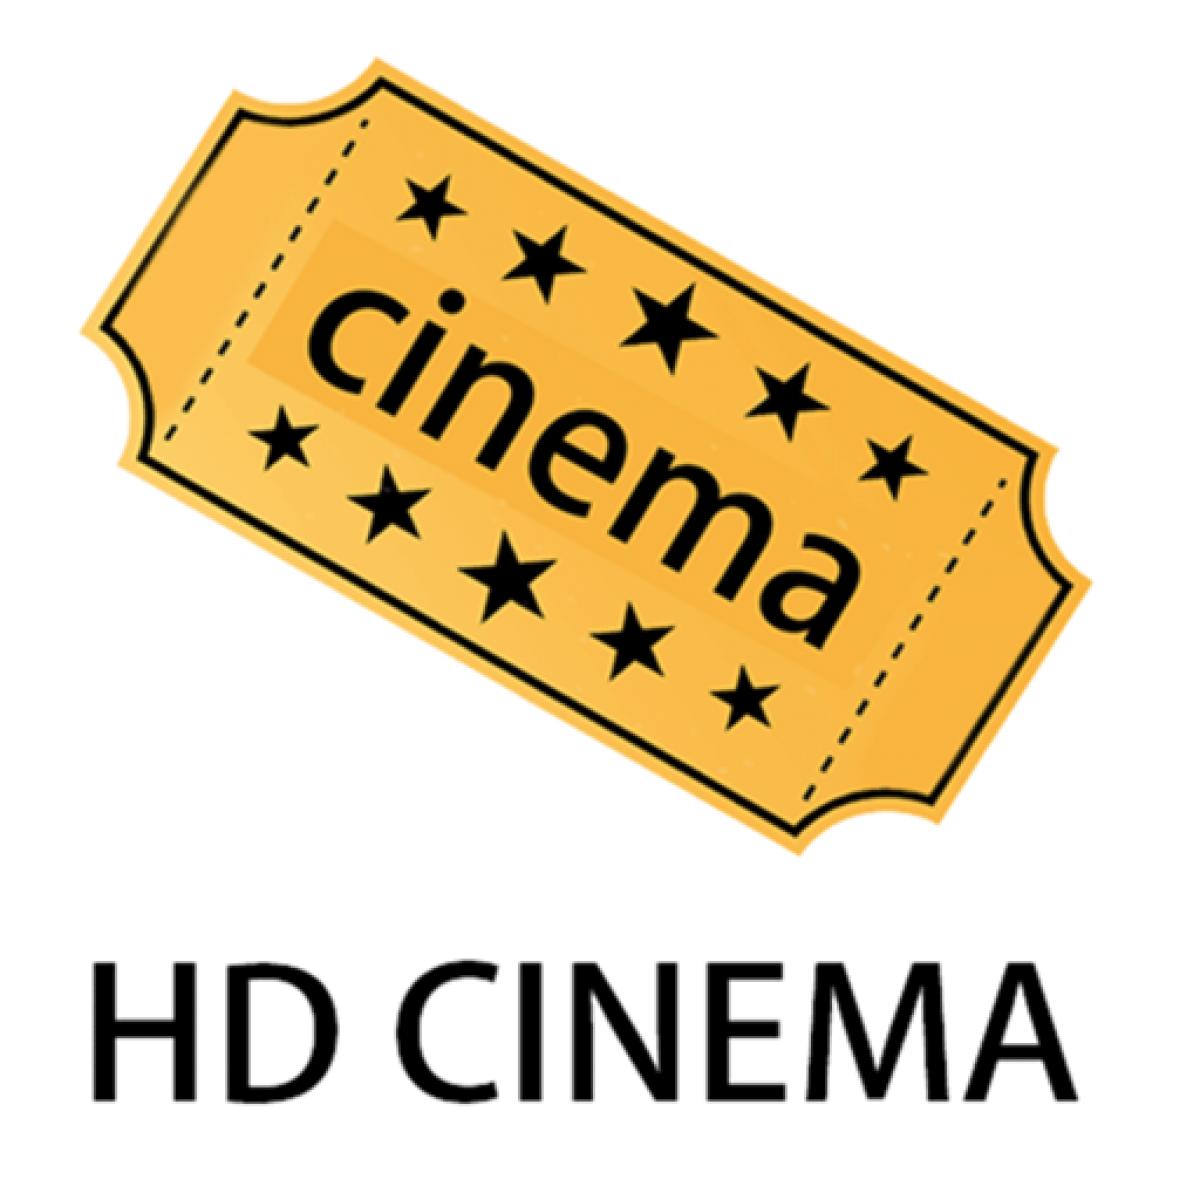 How to Install Cinema HD APK on FireStick (Sep. 9)